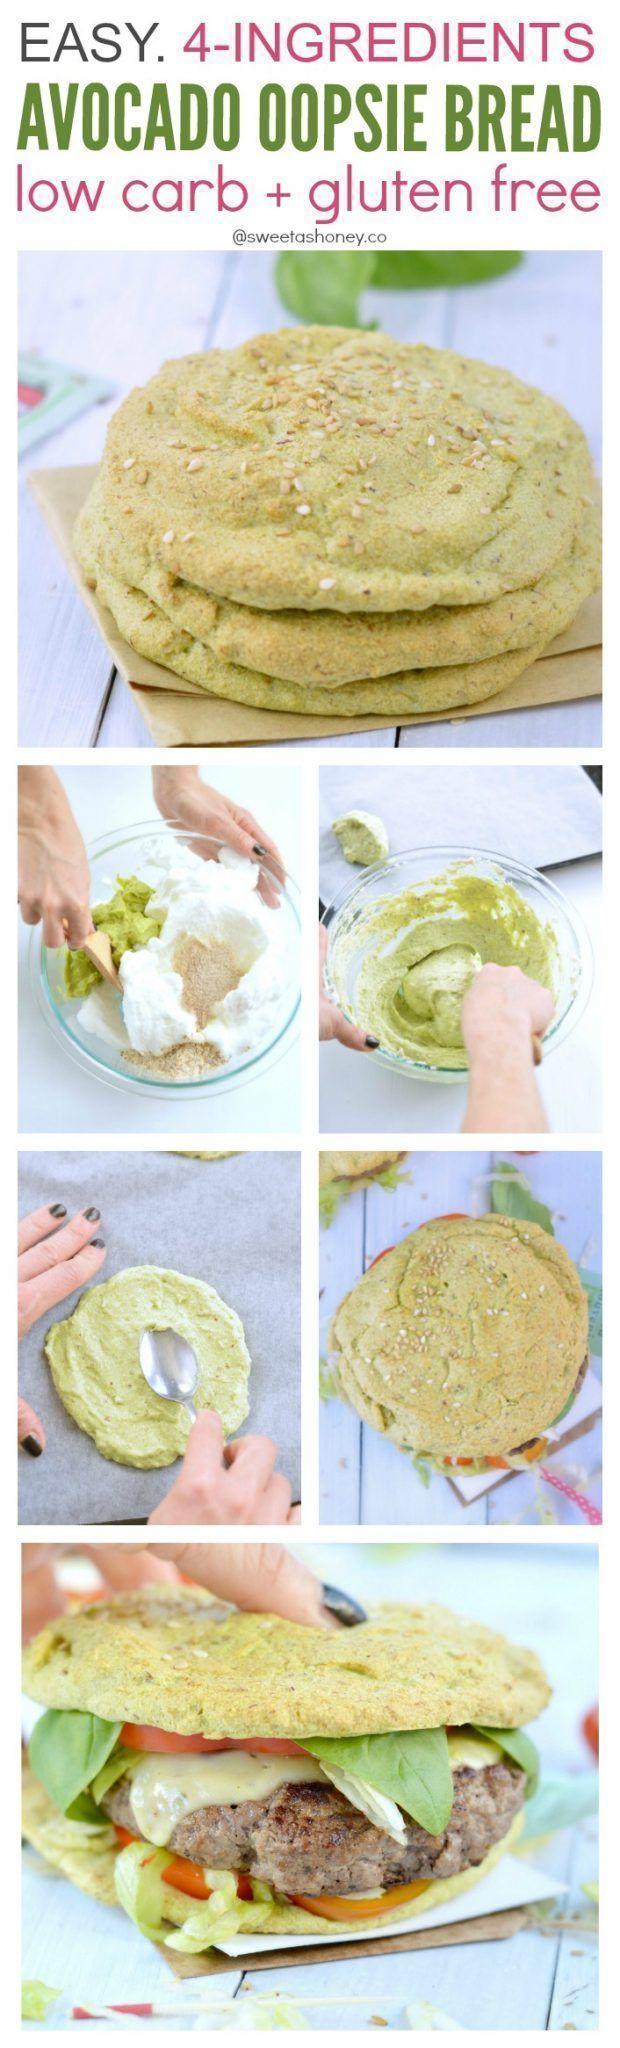 Dairy free keto oopsie bread with avocado | | Easy keto recipes